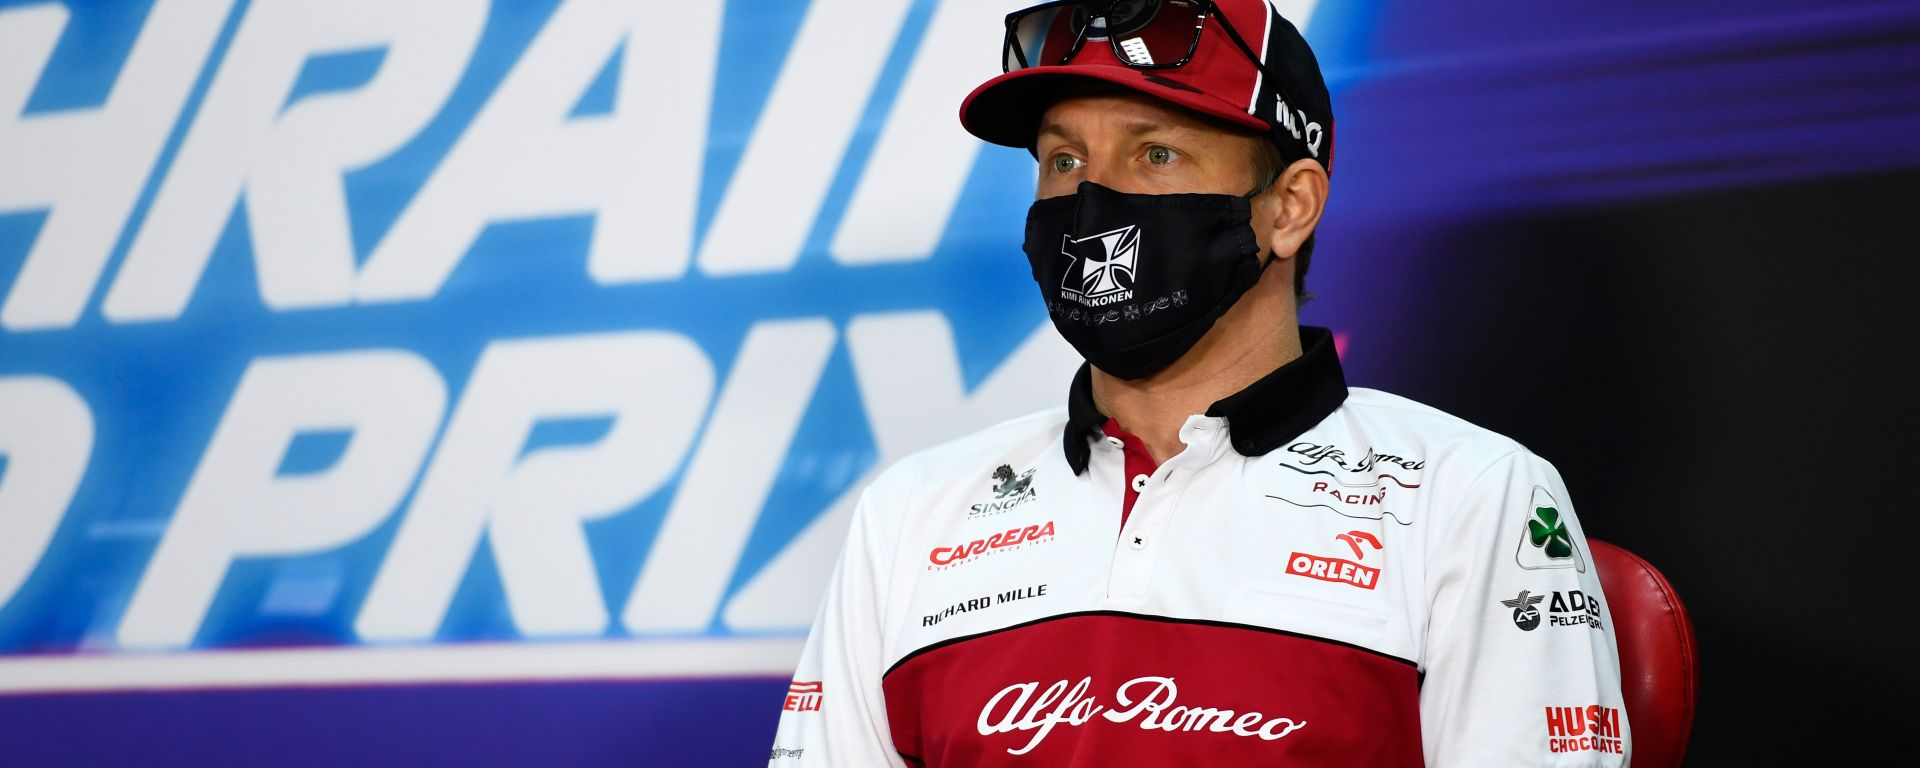 F1, GP Bahrain 2020: Kimi Raikkonen (Alfa Romeo)